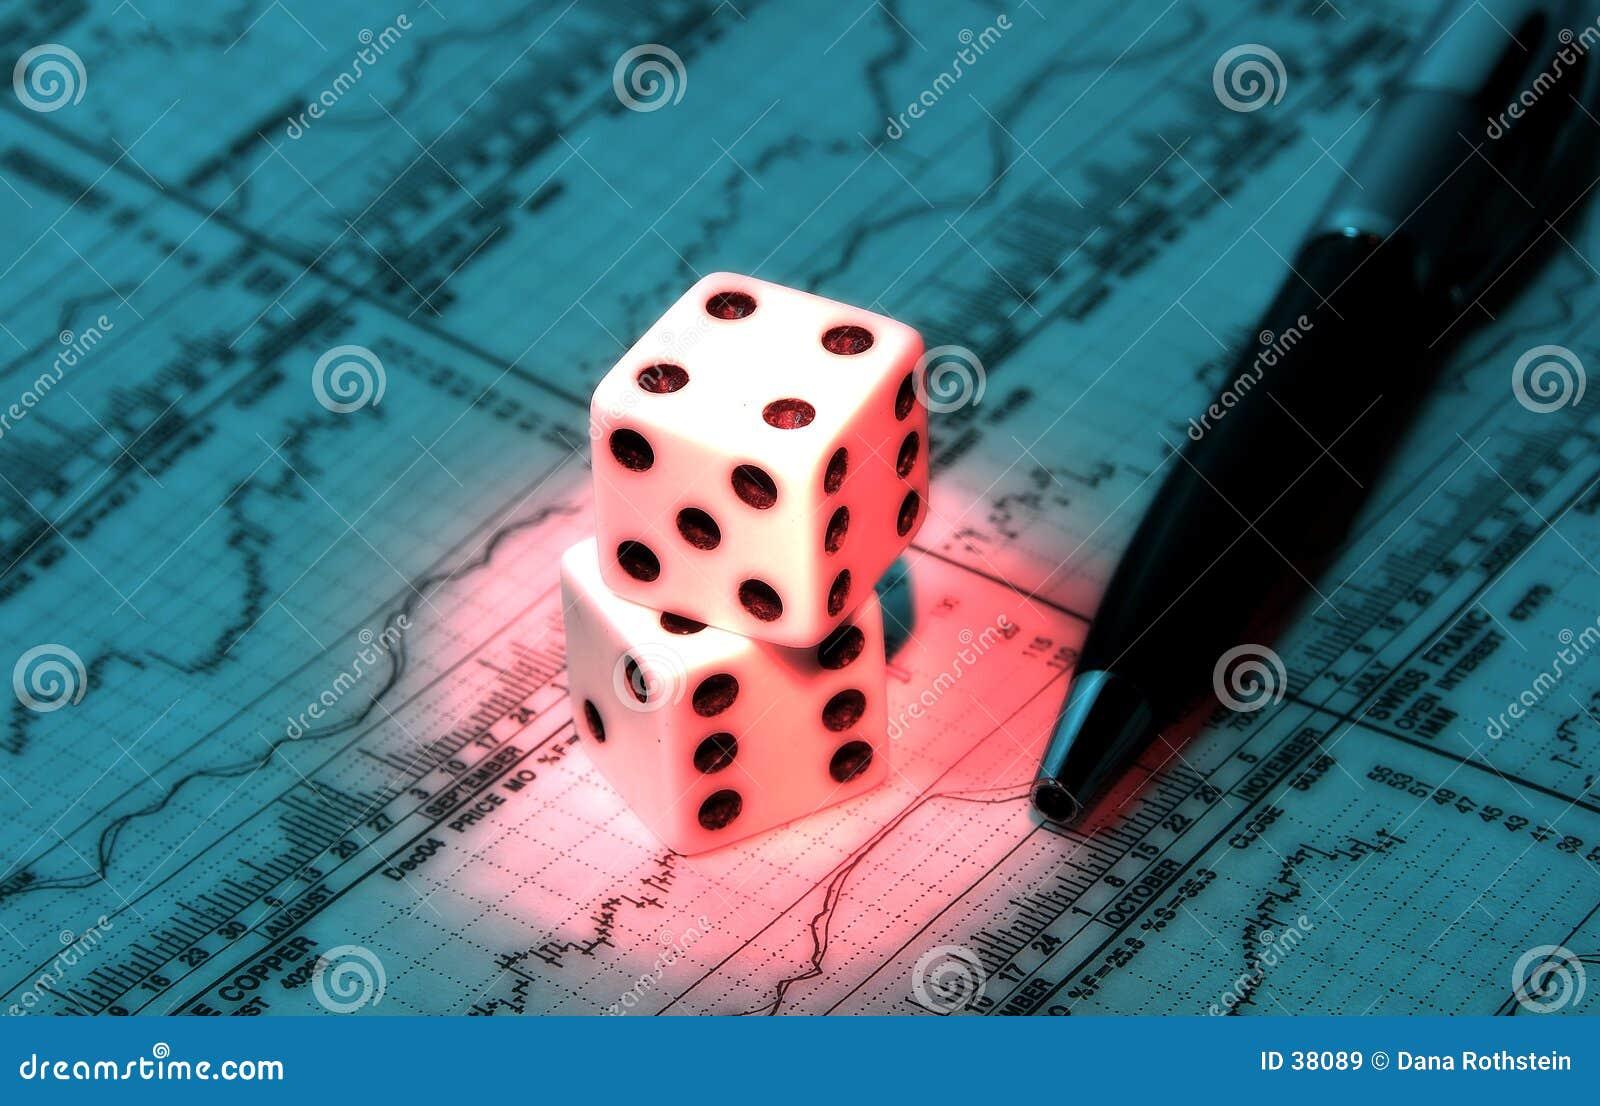 Investment Gamble